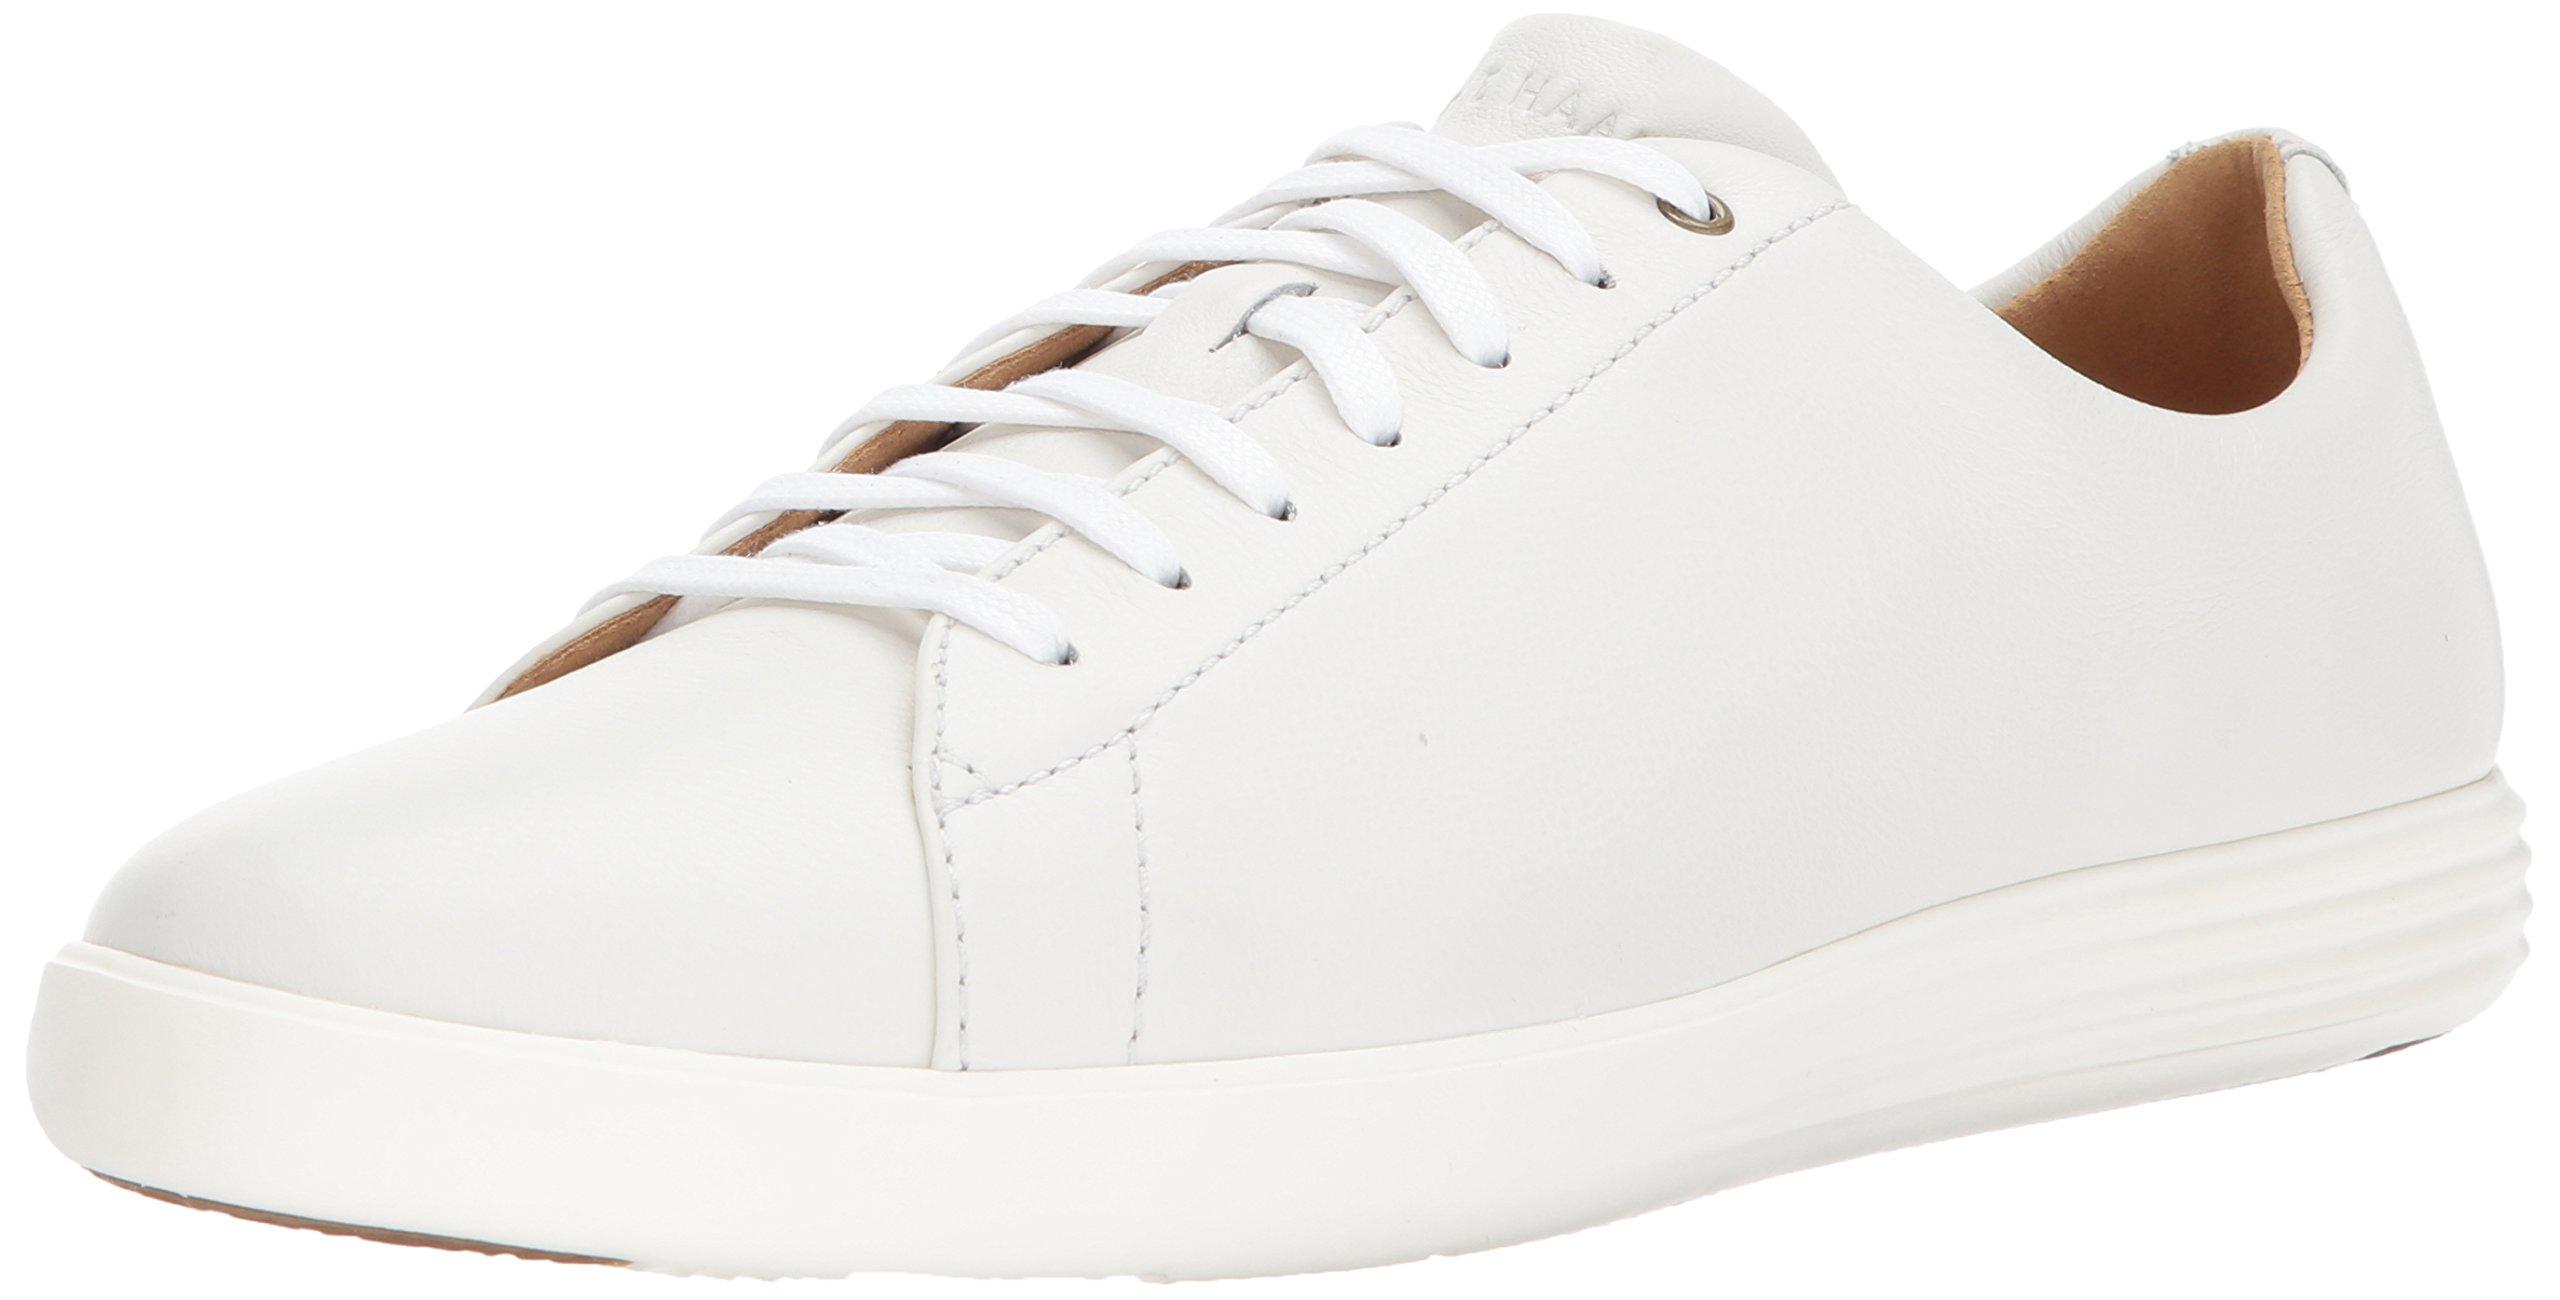 Cole Haan Men's Grand Crosscourt II Sneaker White Leather 10.5 Medium US